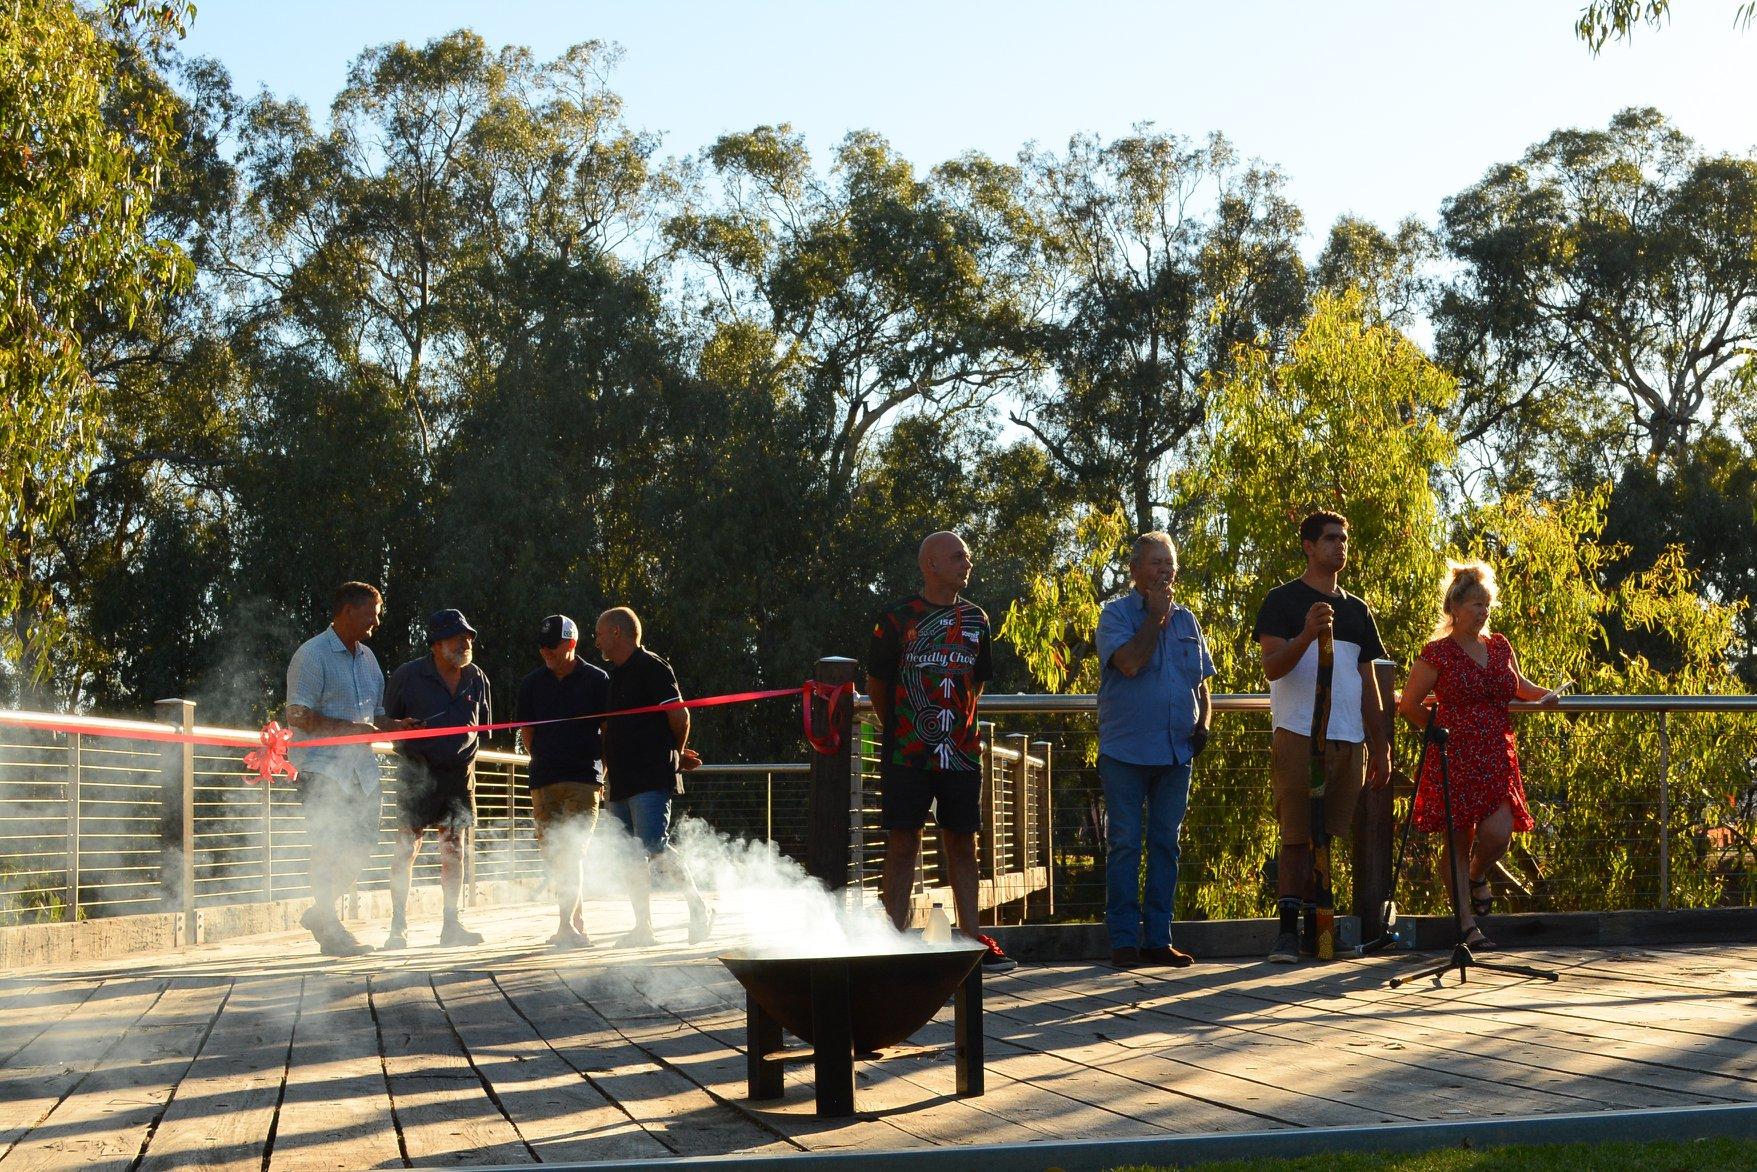 barham_boardwalk_smoking_ceremony.jpg